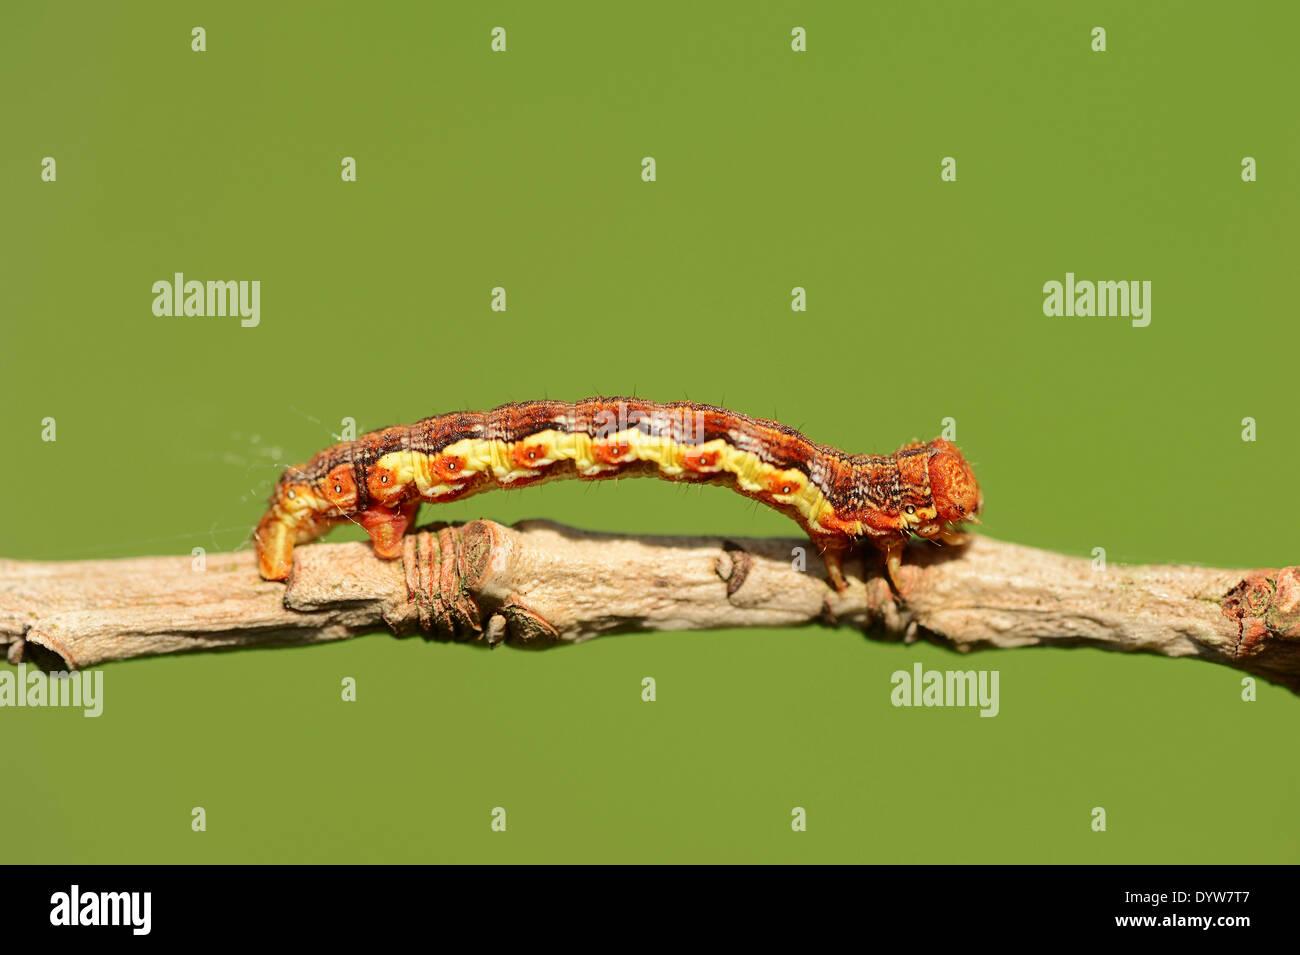 Umber (Erannis defoliaria moteado), Caterpillar, Renania del Norte-Westfalia, Alemania Imagen De Stock